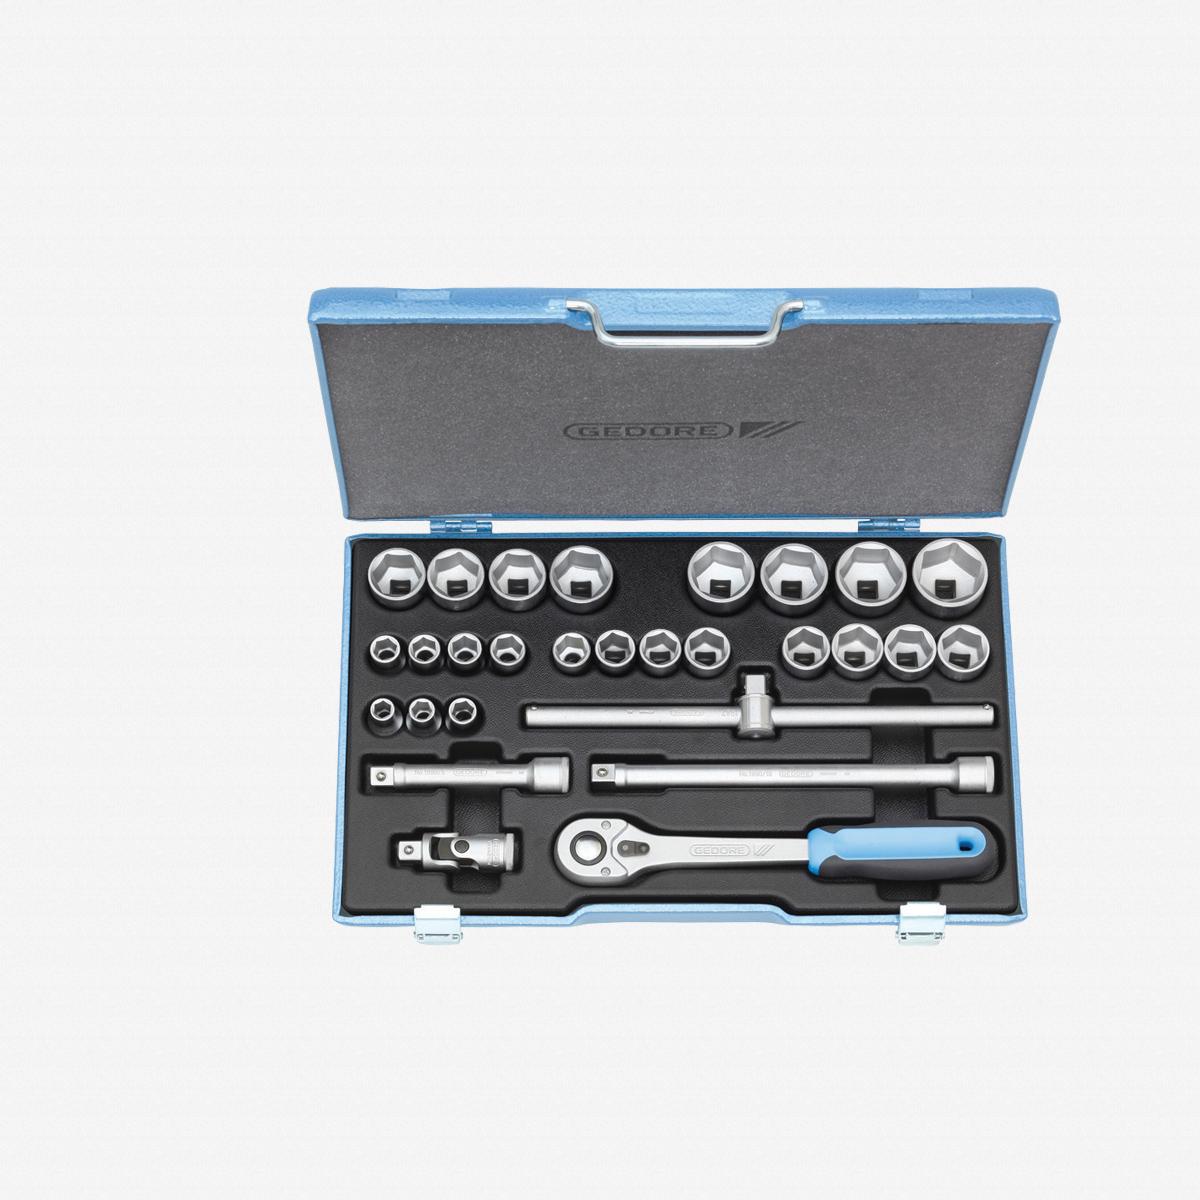 "Gedore 19 VMU-10 Socket set 1/2"" 28 pcs hex 10-36 mm - KC Tool"